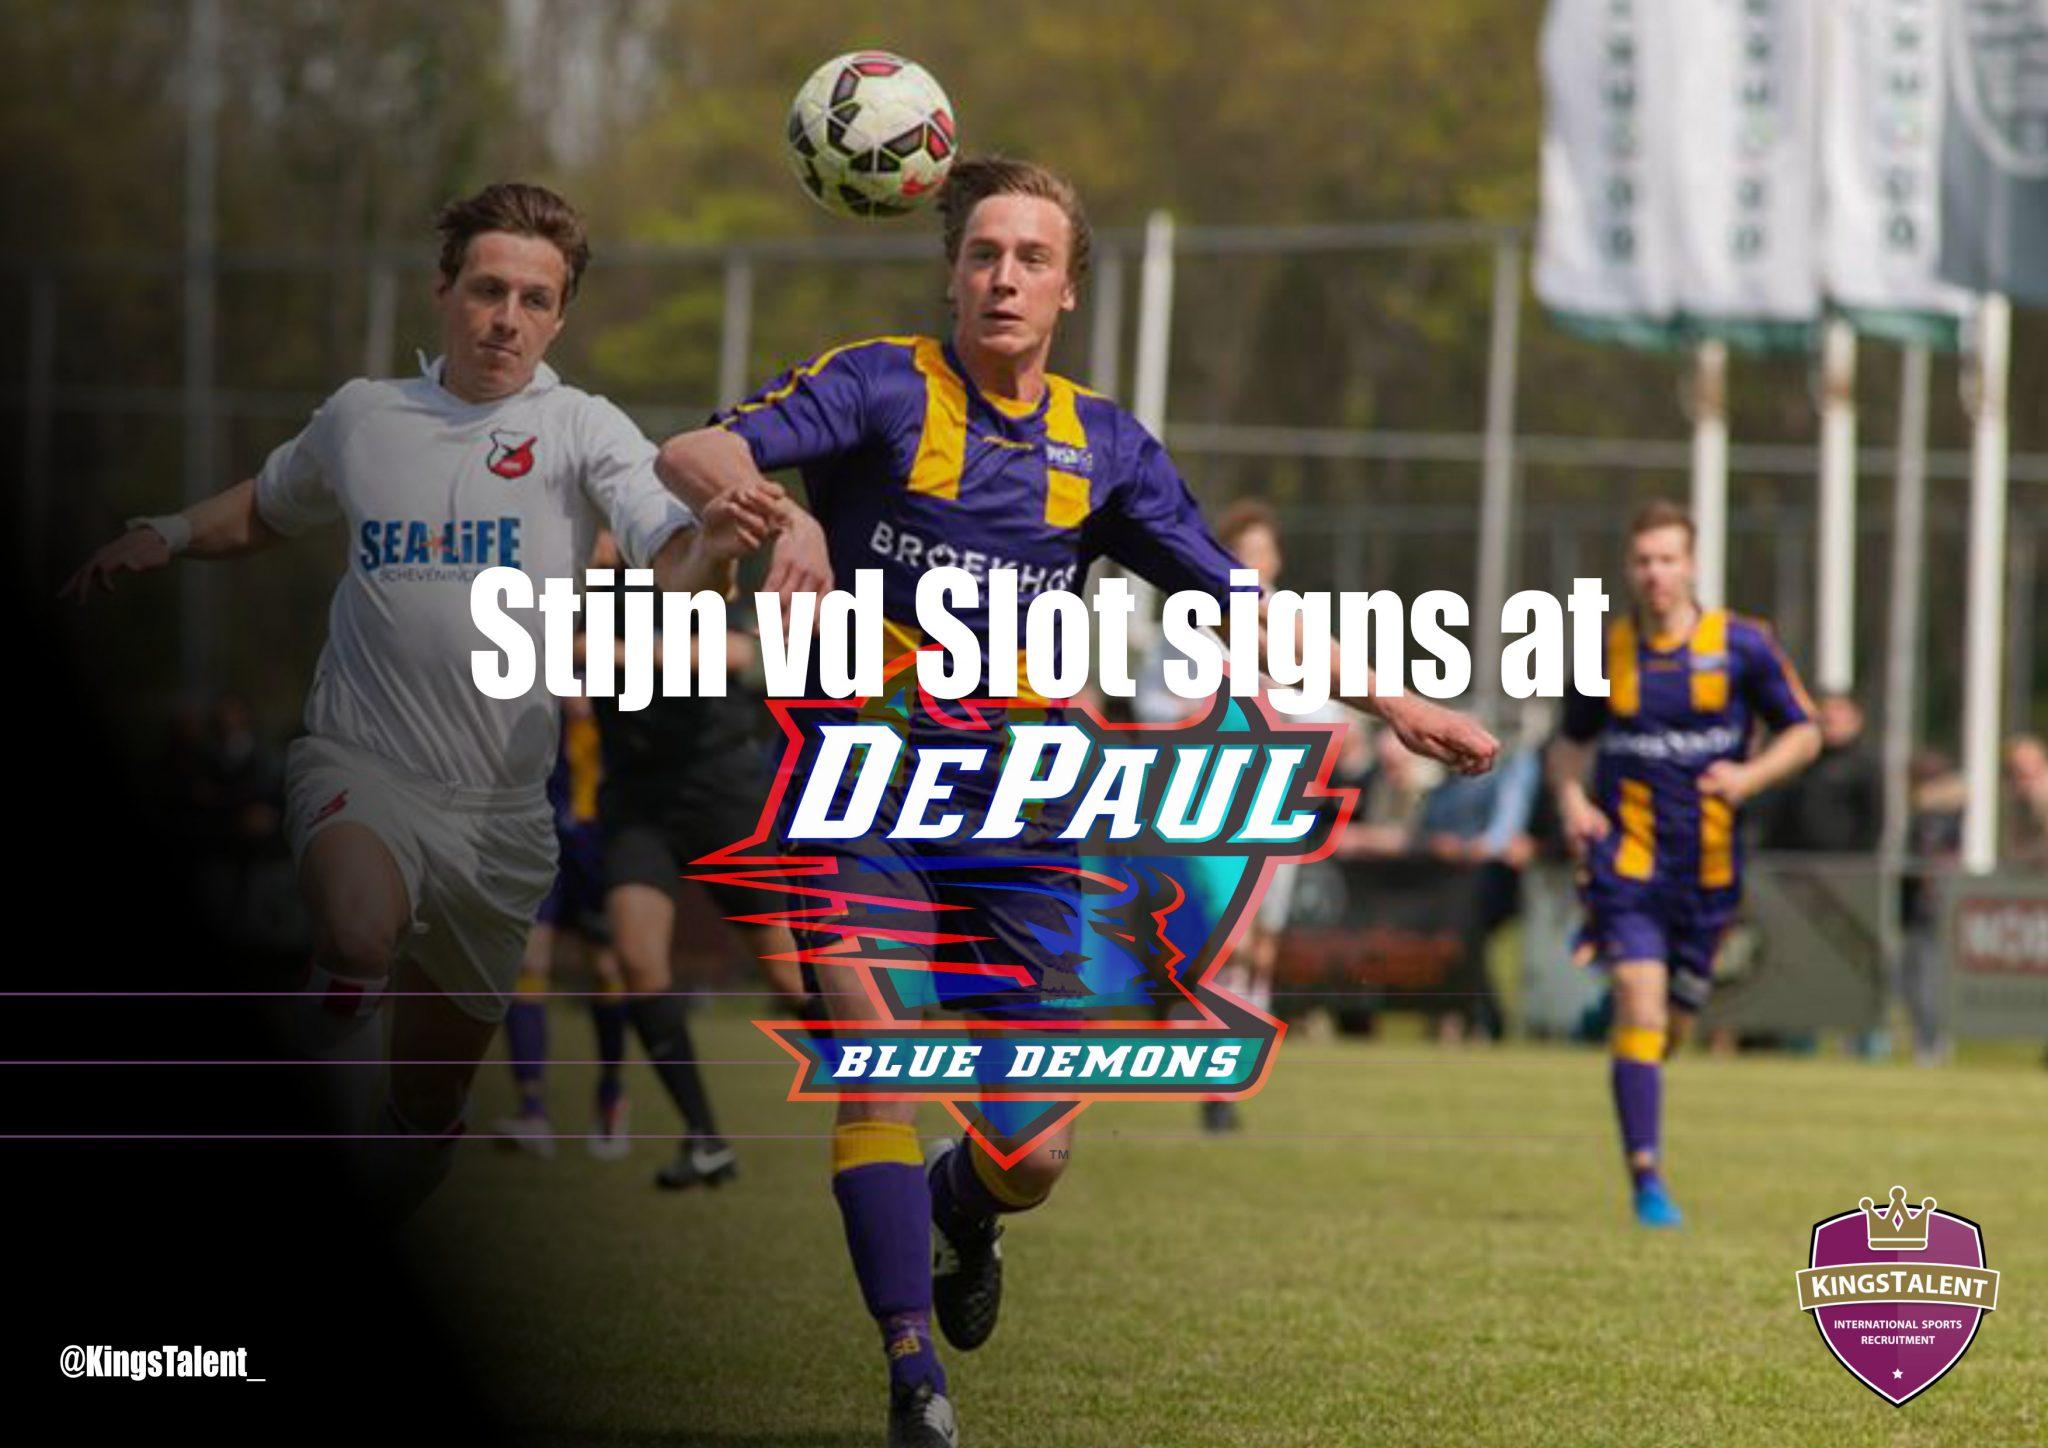 Stijn van der Slot signs at DePaul2